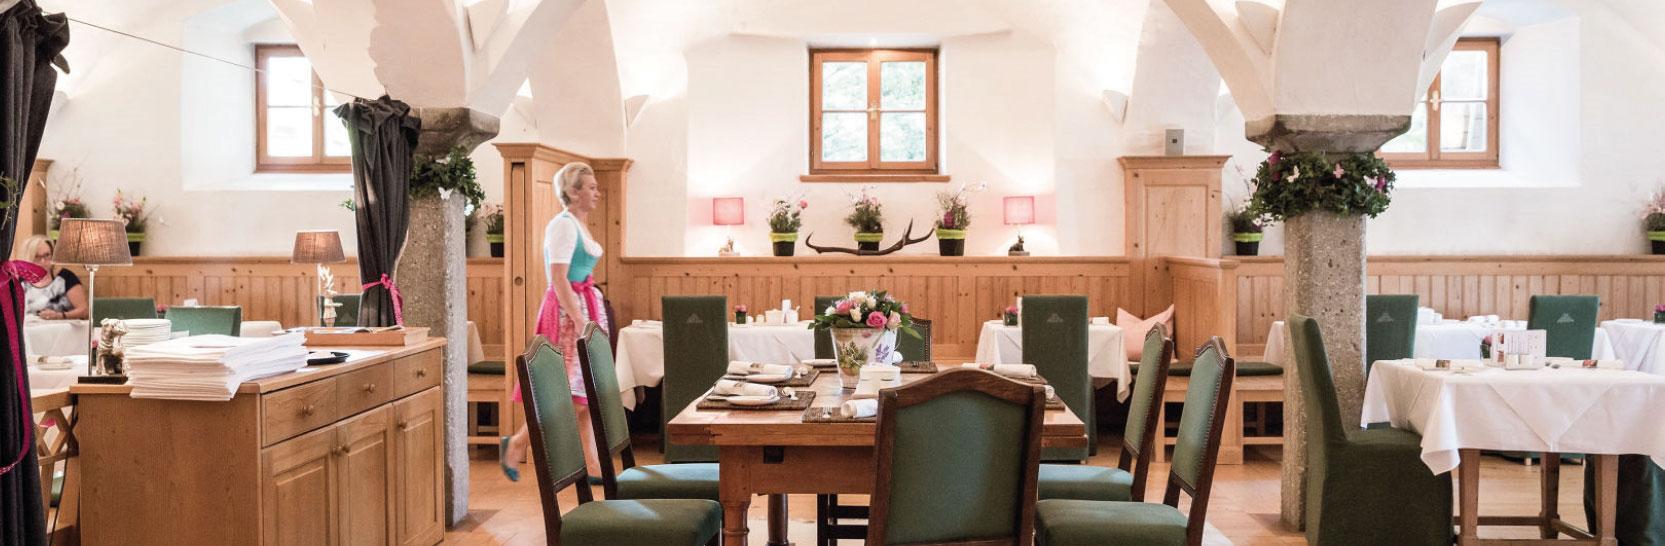 Frau geht im Dirndl durch Speisesaal